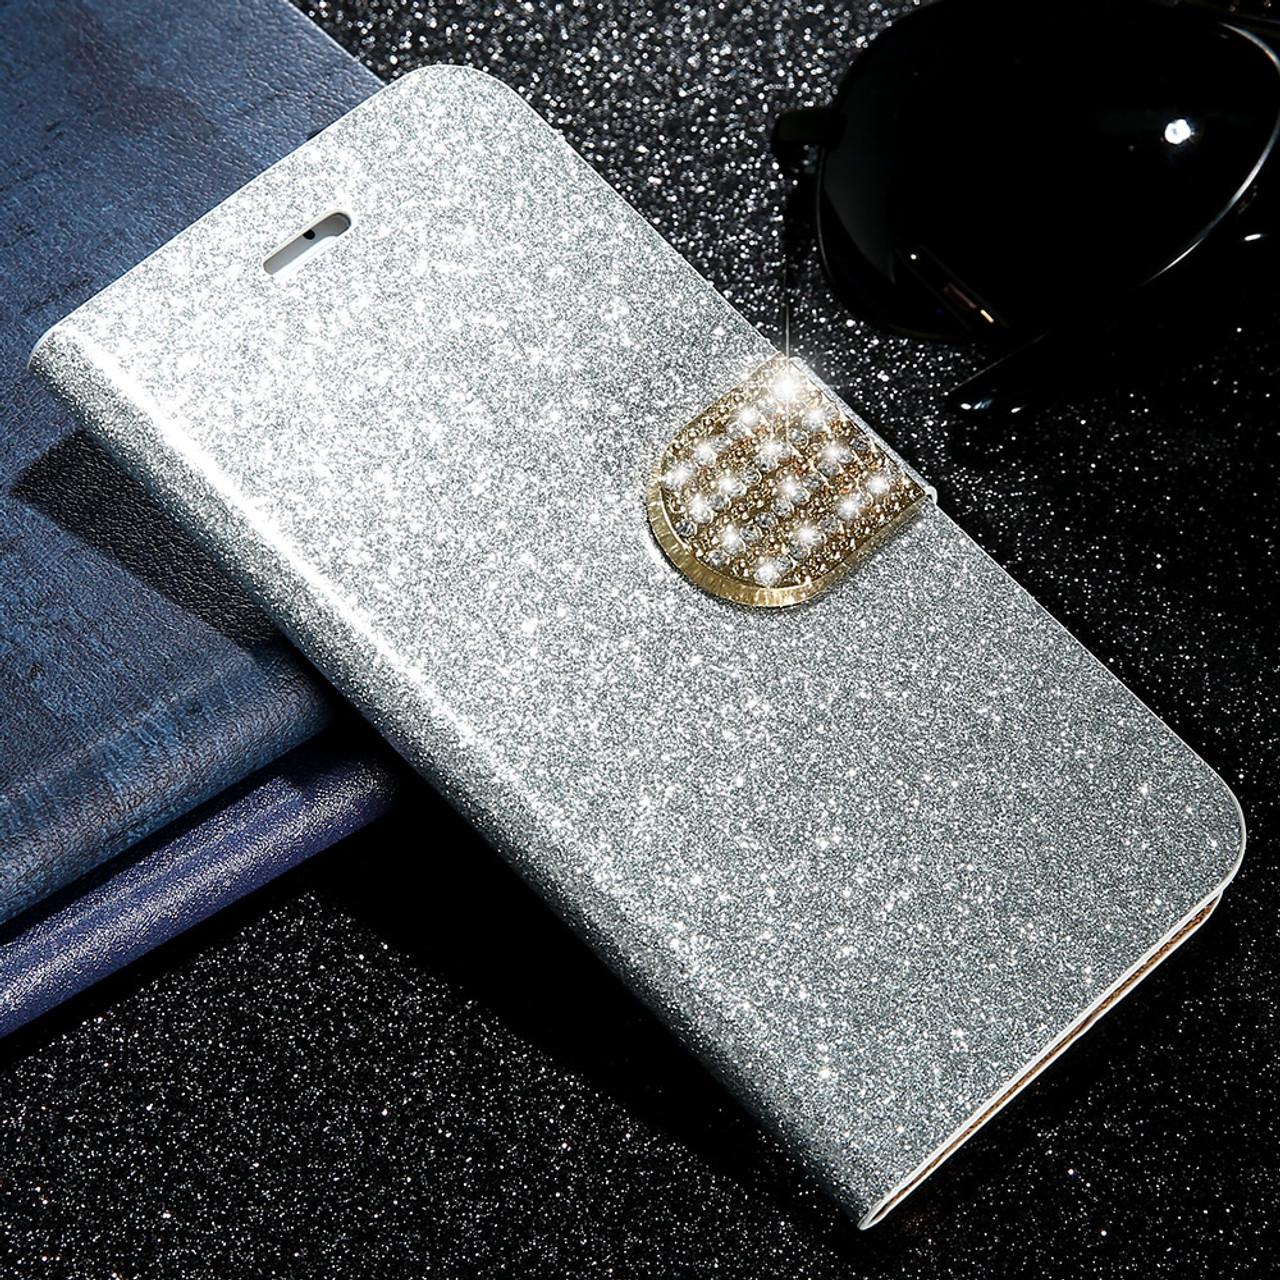 ... KISSCASE Bling Flip Wallet Phone Case For iPhone X 8 7 6 6s 7 Plus  Phone ... bd5dac668